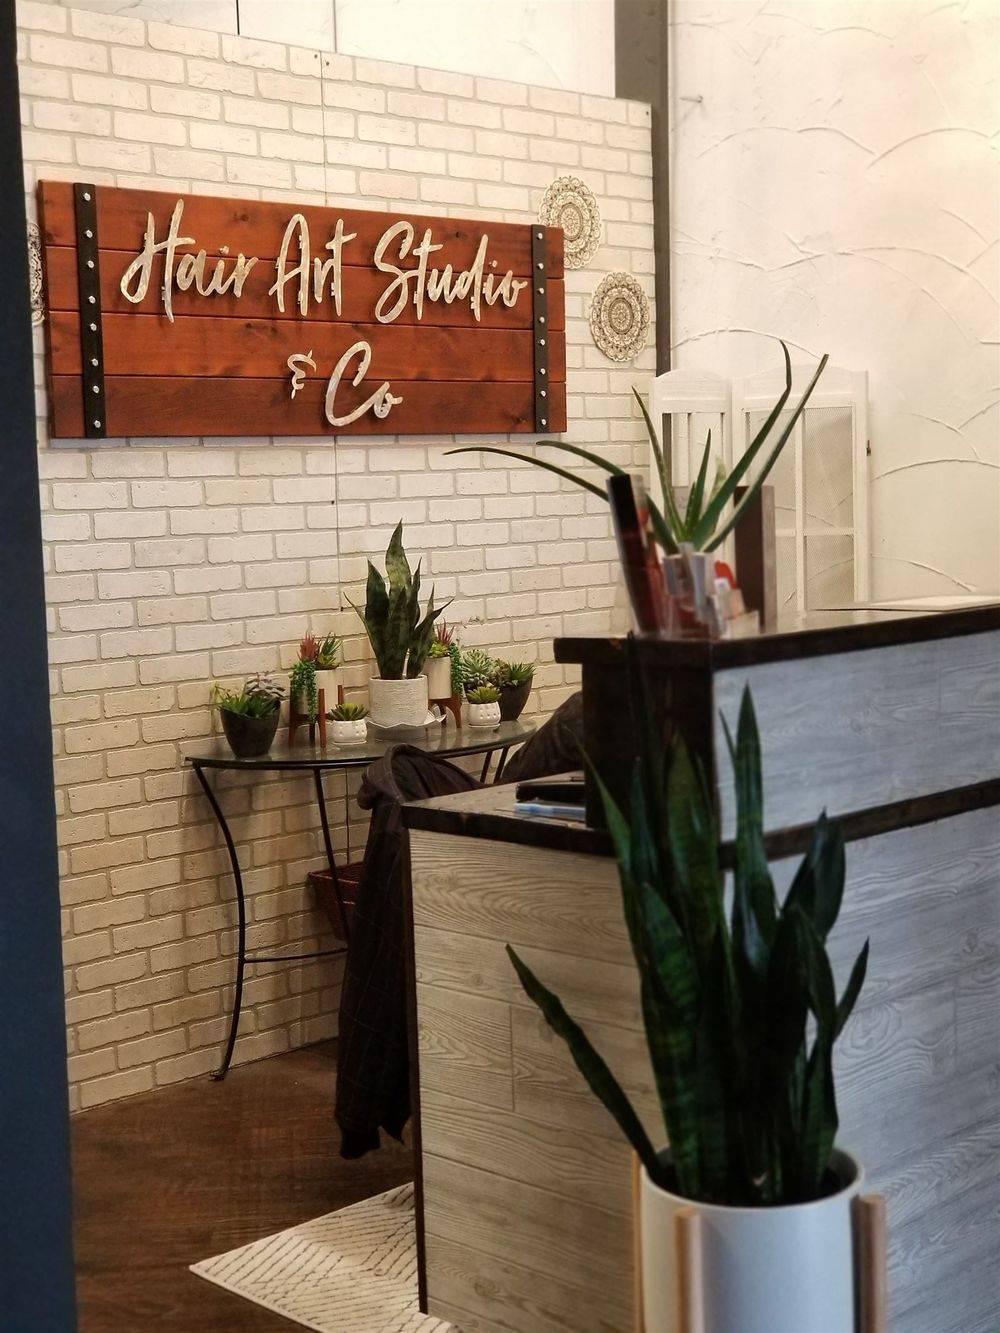 Hair Art Studio & Co Salon